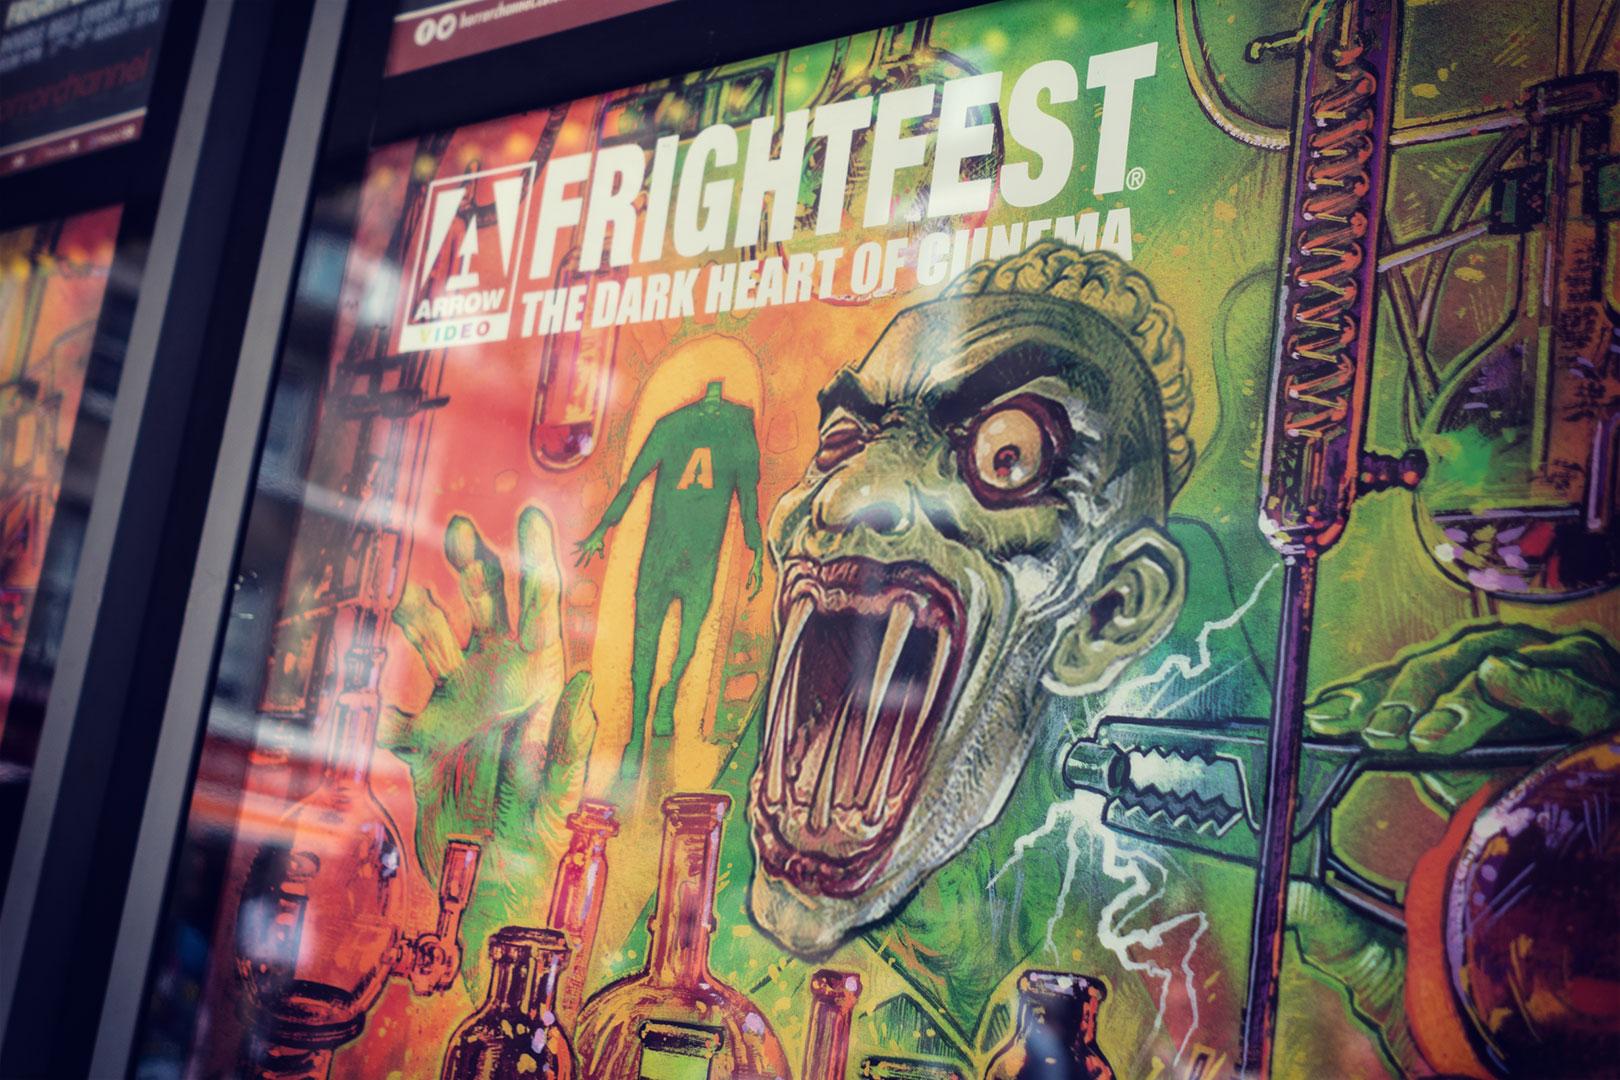 19. FrightFest